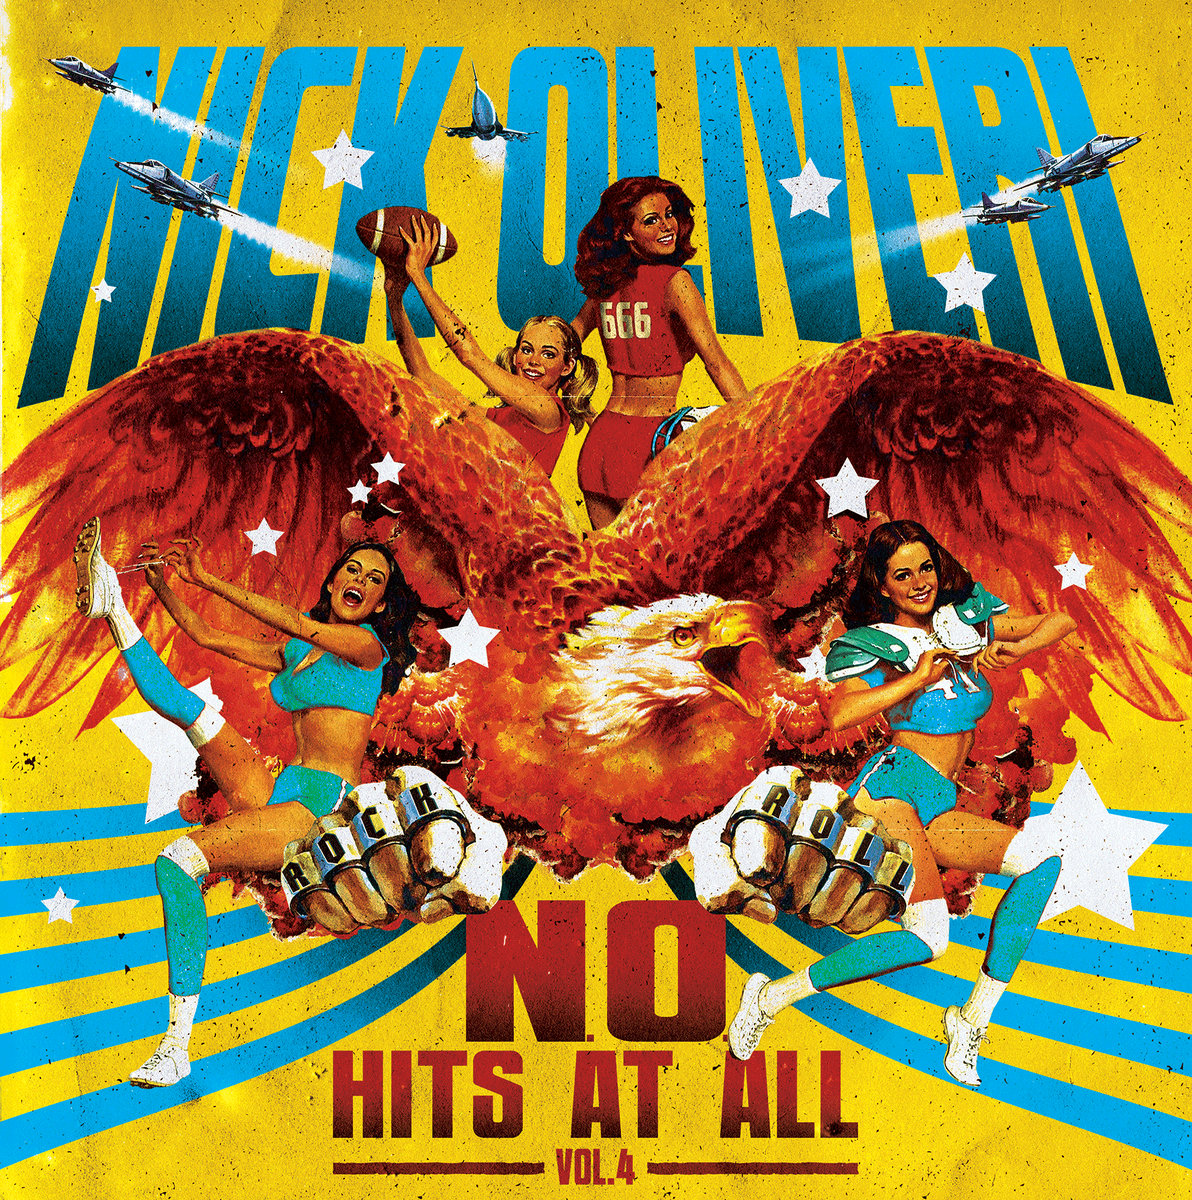 Nick Oliveri - N.O. Hits At All Vol. 4 [LP]